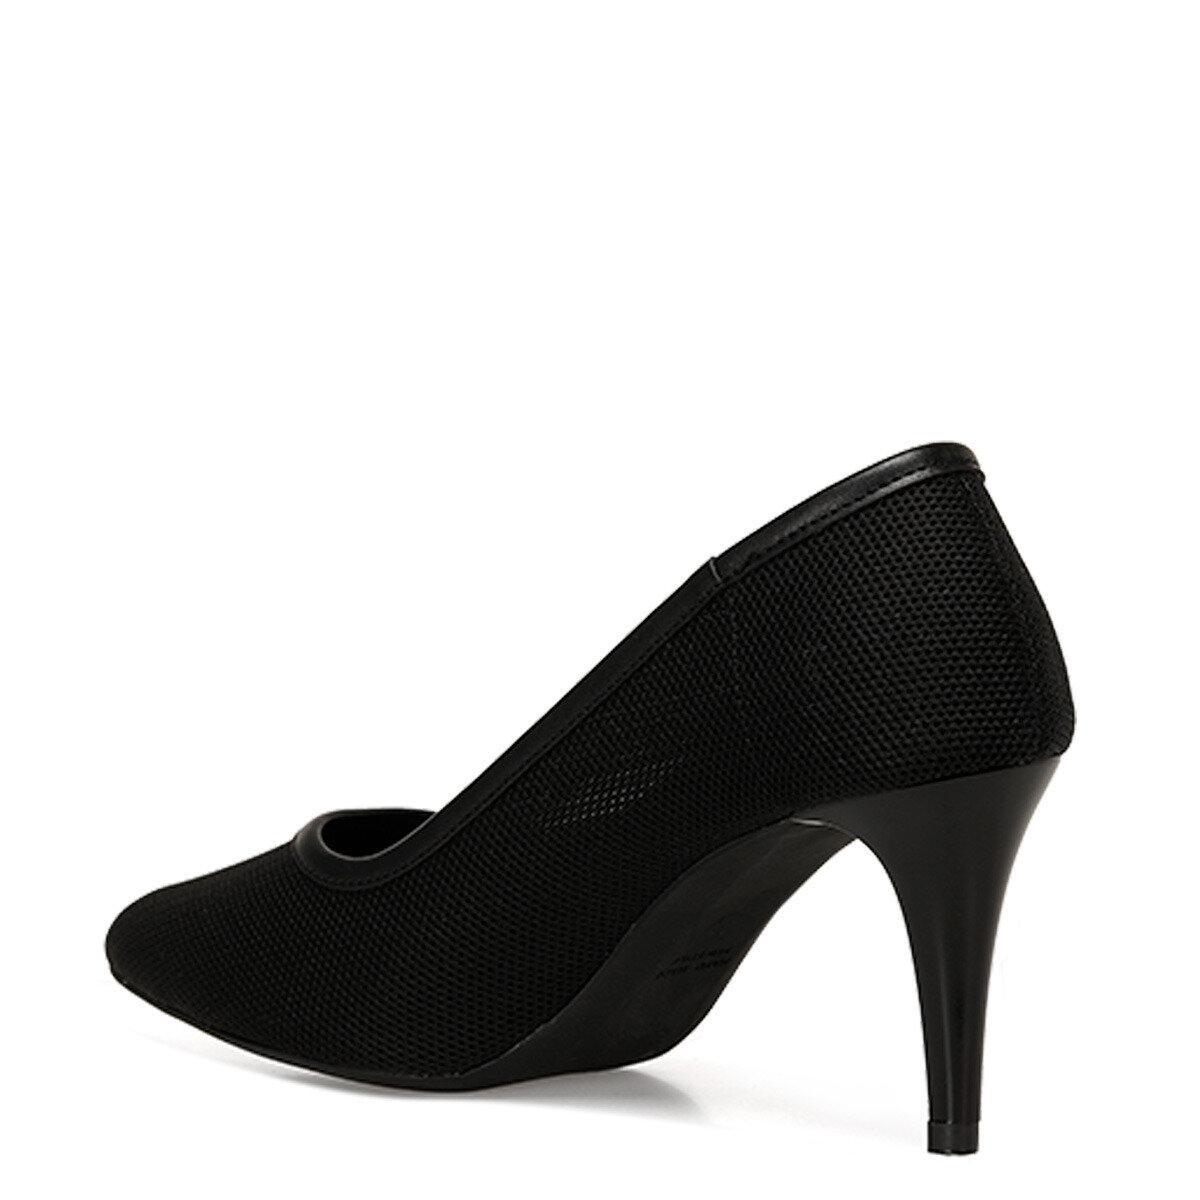 KNITTED Siyah Kadın Topuklu Ayakkabı